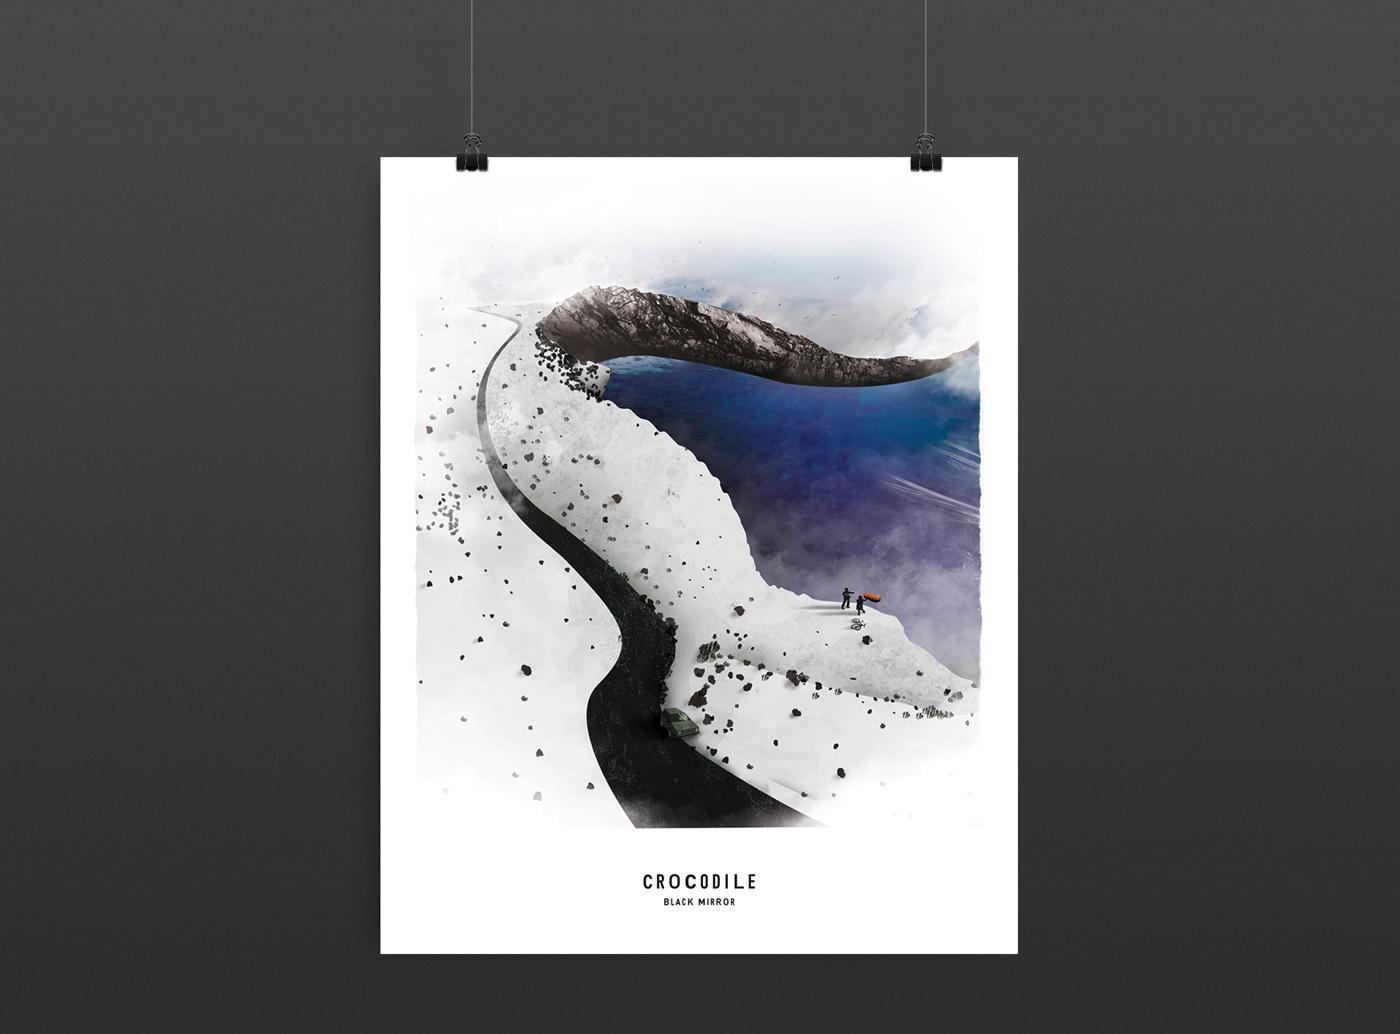 ZanBarnett_BlackMirror-Crocodile.jpg